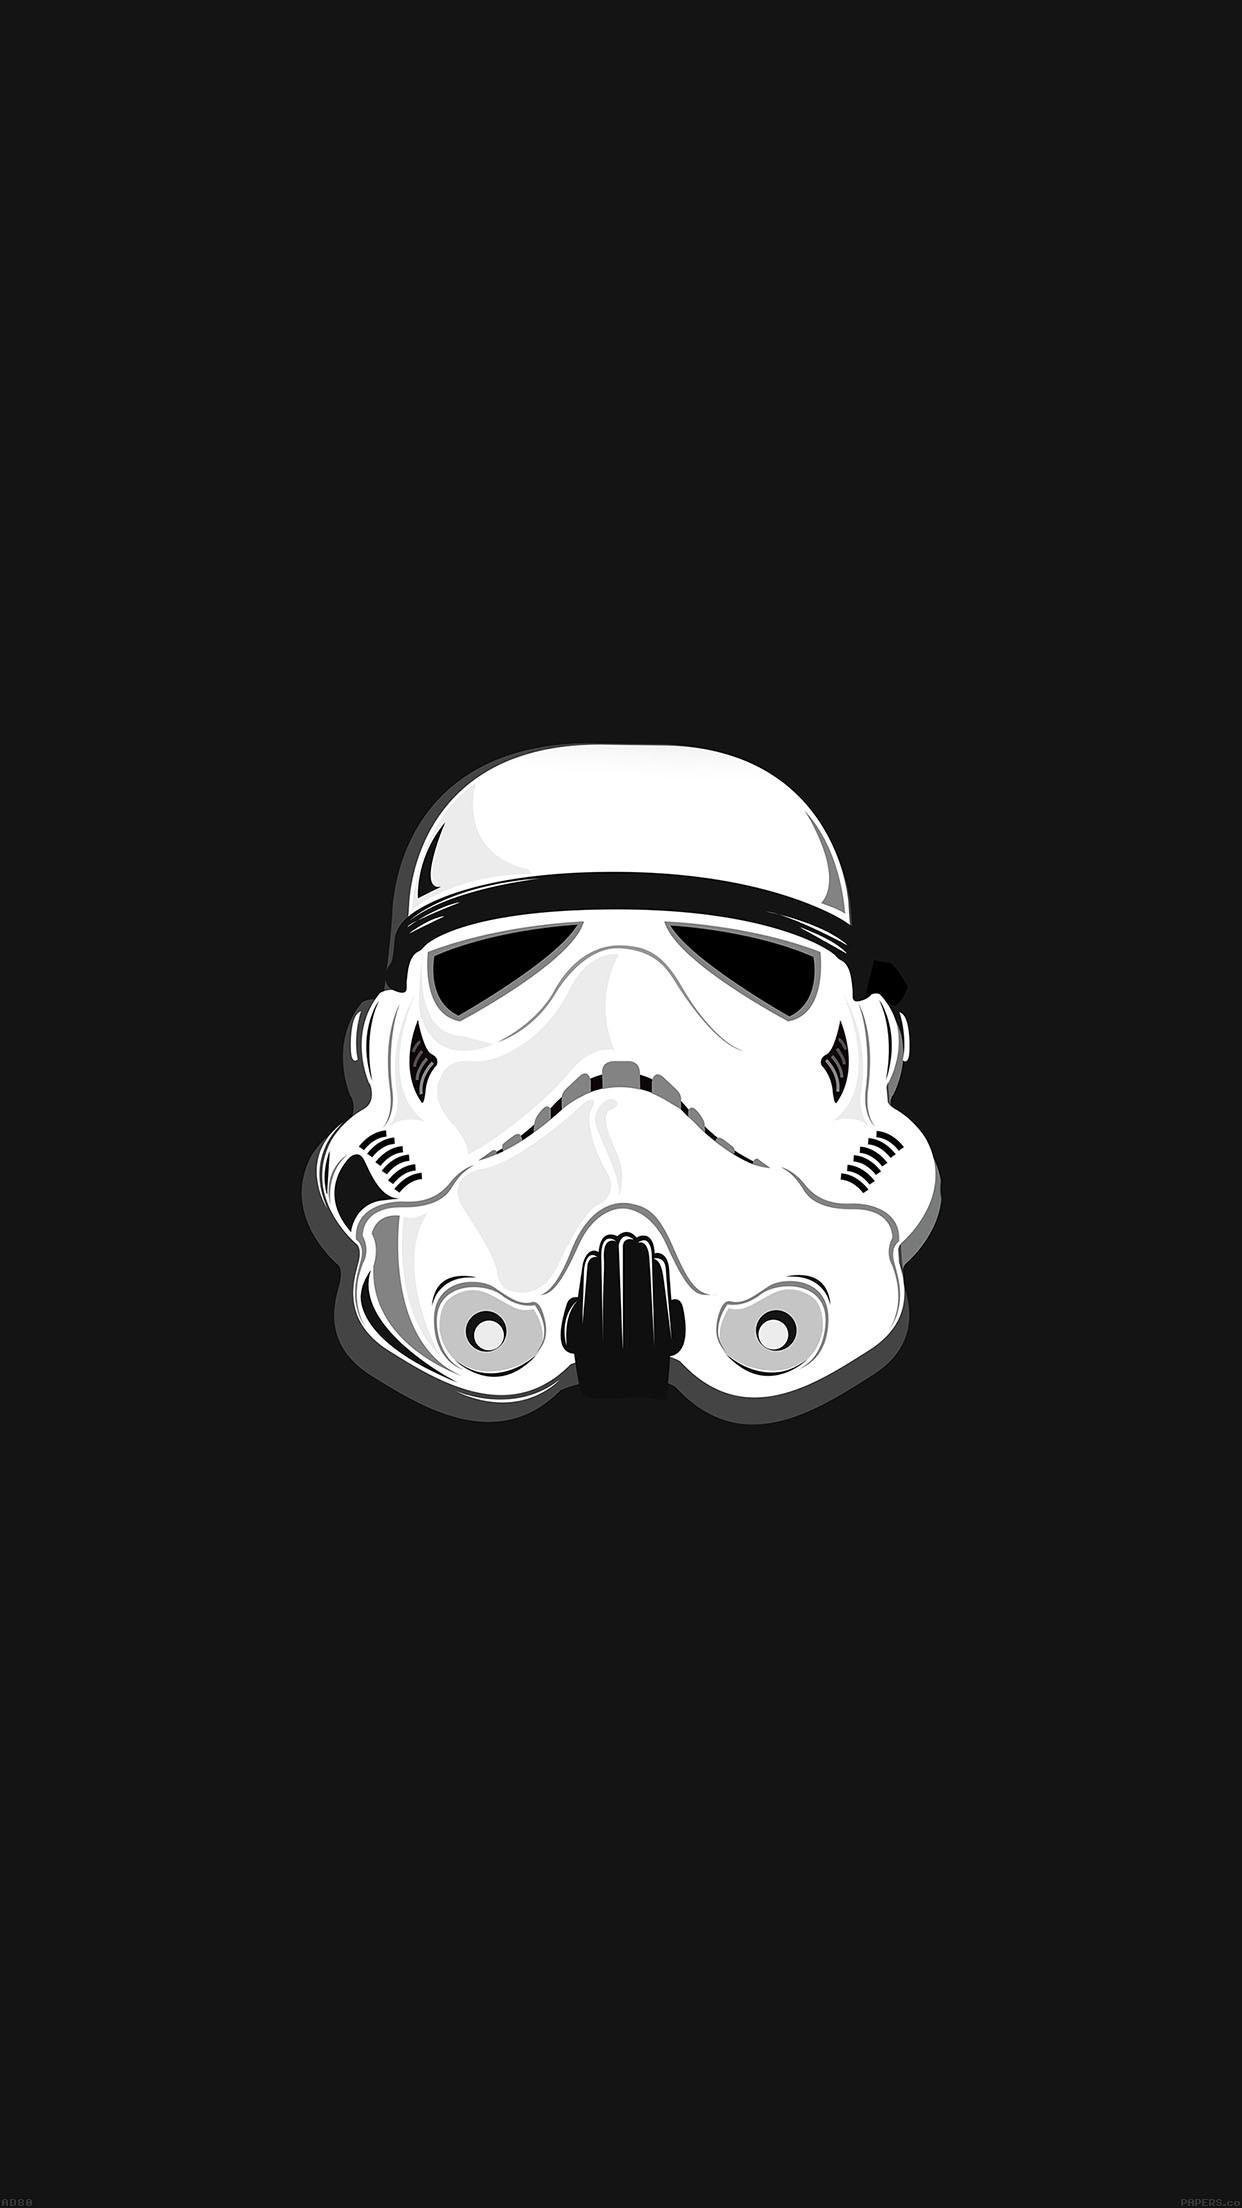 Star Wars Stormtrooper Illustration iPhone 6 Plus HD Wallpaper